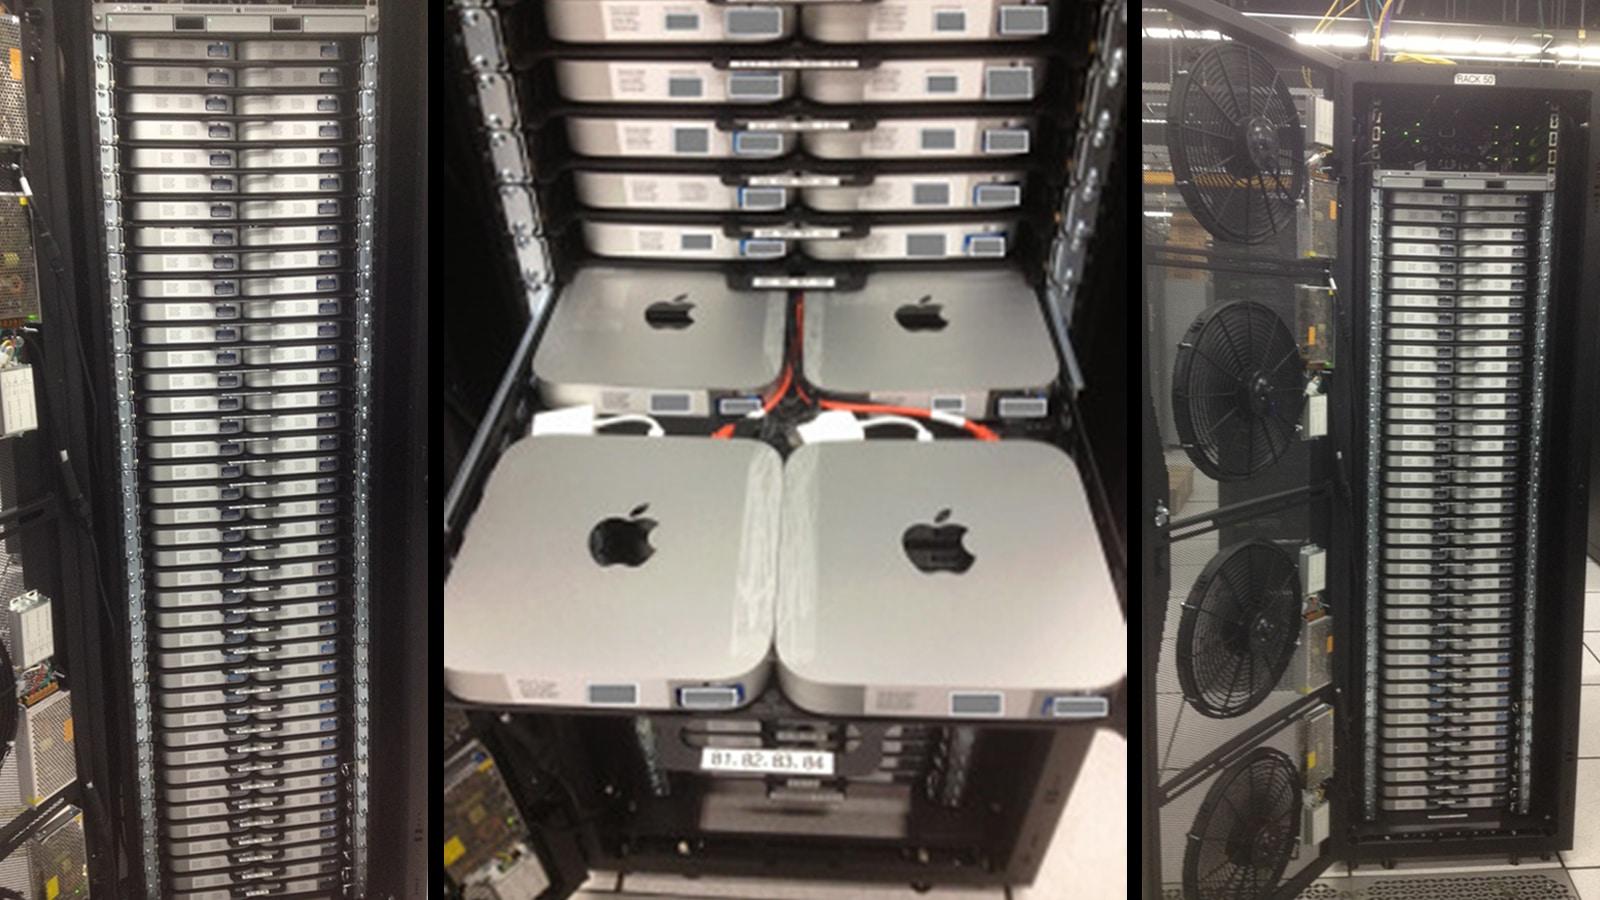 ERNC: Los centros de datos de Apple en Europa funcionarán solo con energías renovables.